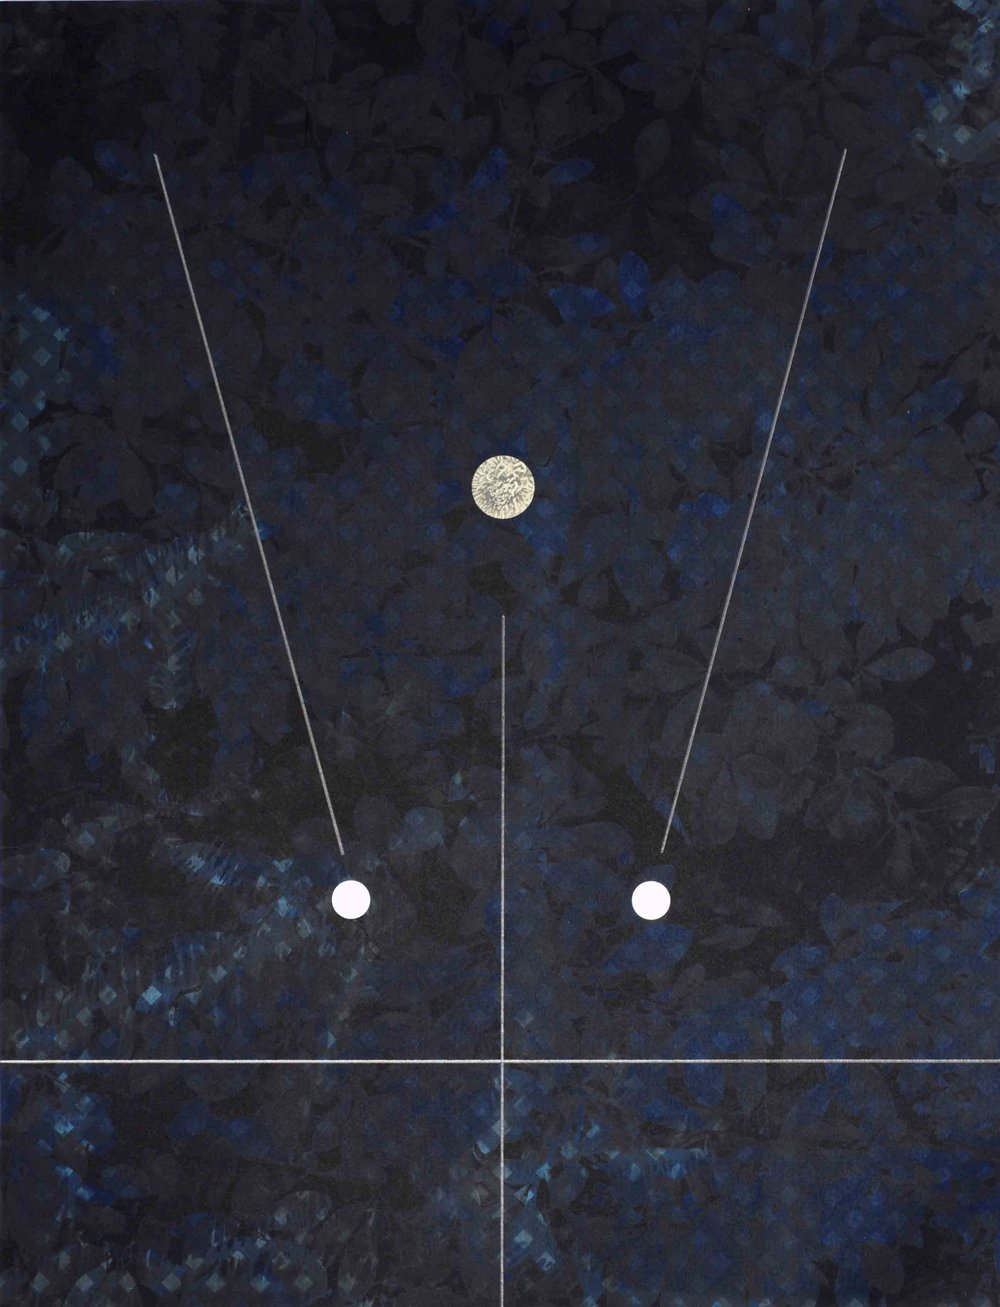 Charlie Boisson  kaya sthairyam  2016 cyanotype, tirage numérique, graphite 26 x 33,8 cm © courtesy of the artist & galerie l'inlassable